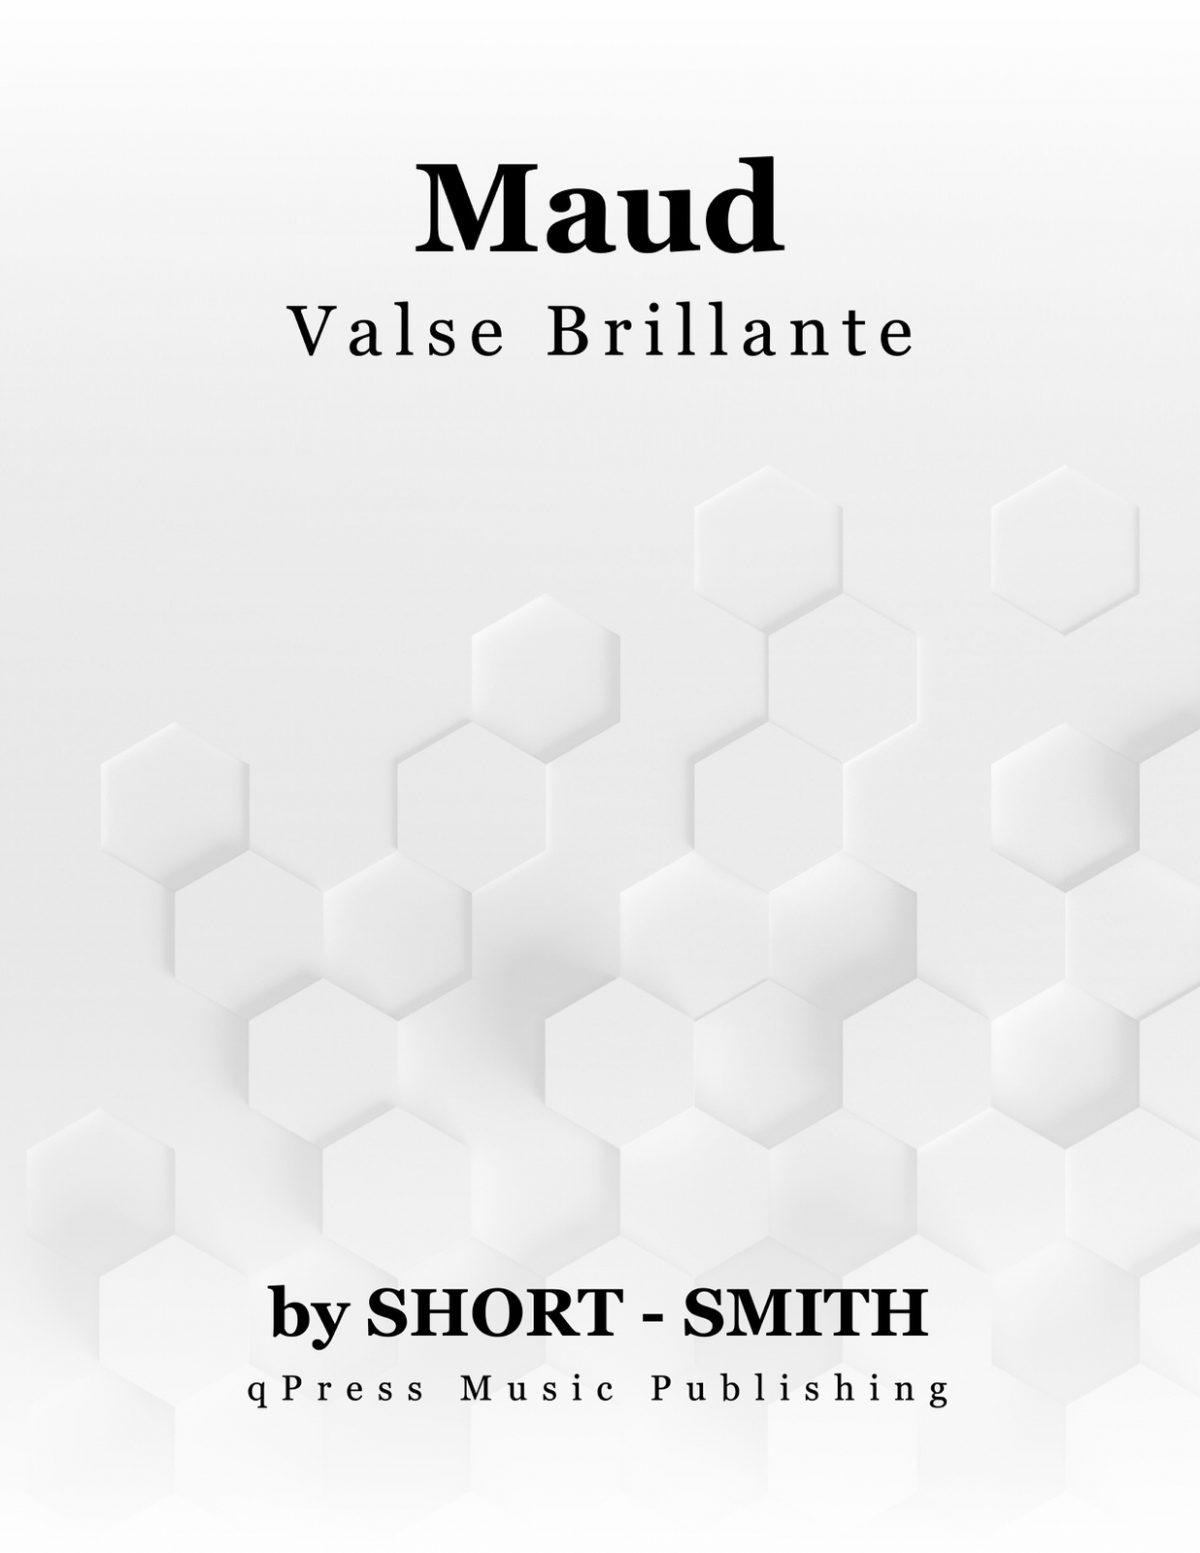 Short-Smith, Maud, Valse Brilliante (Trumpet and Piano)-p01